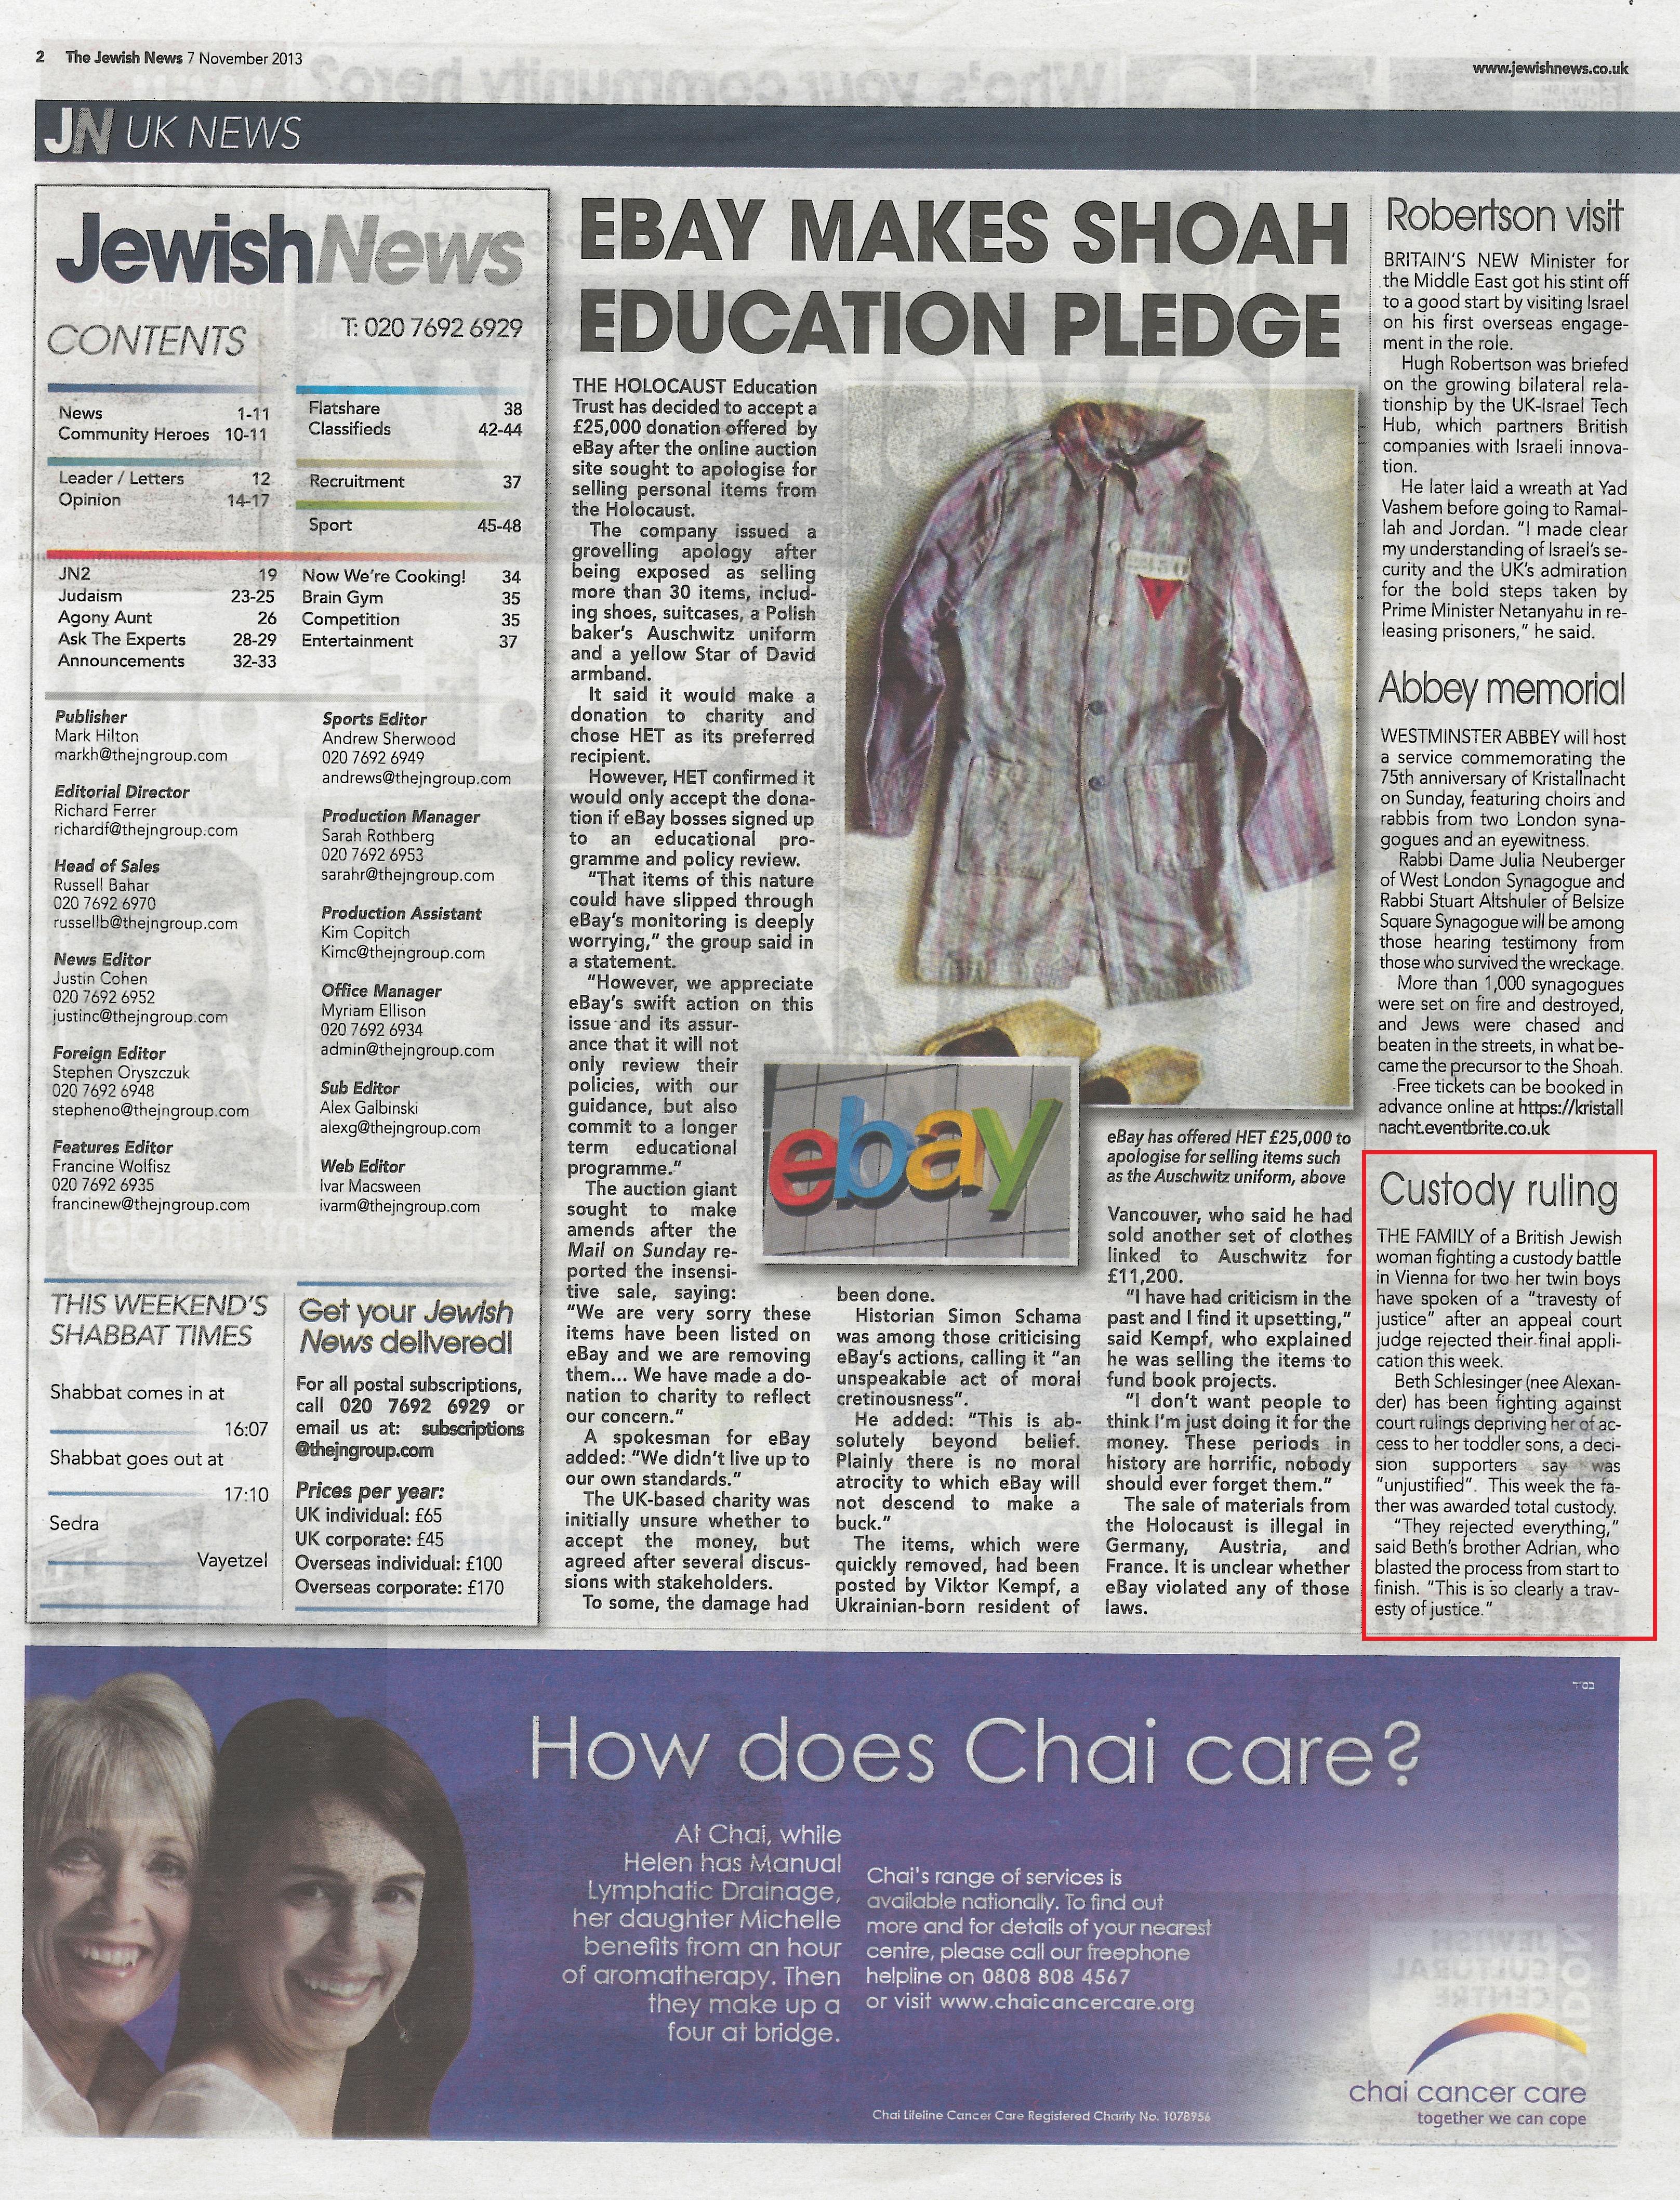 The Jewish News 08.11.2013